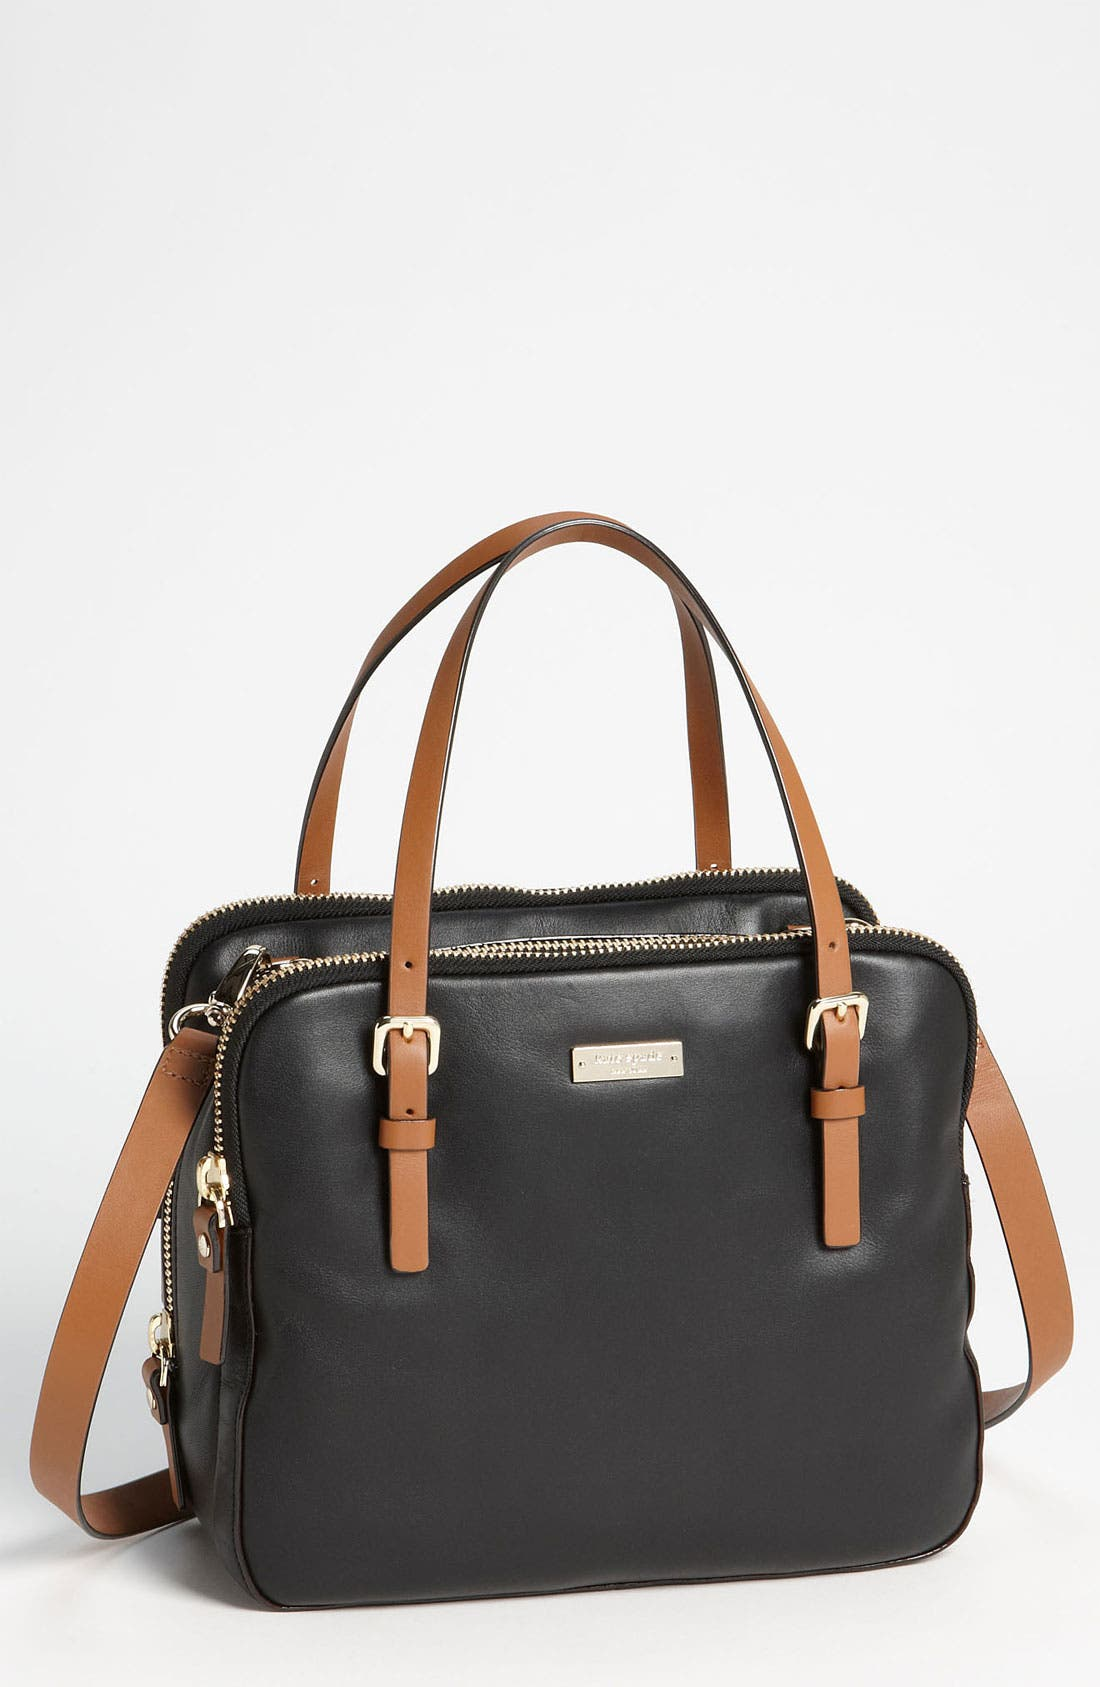 Main Image - kate spade new york 'brightbox boulevard - jude' handbag